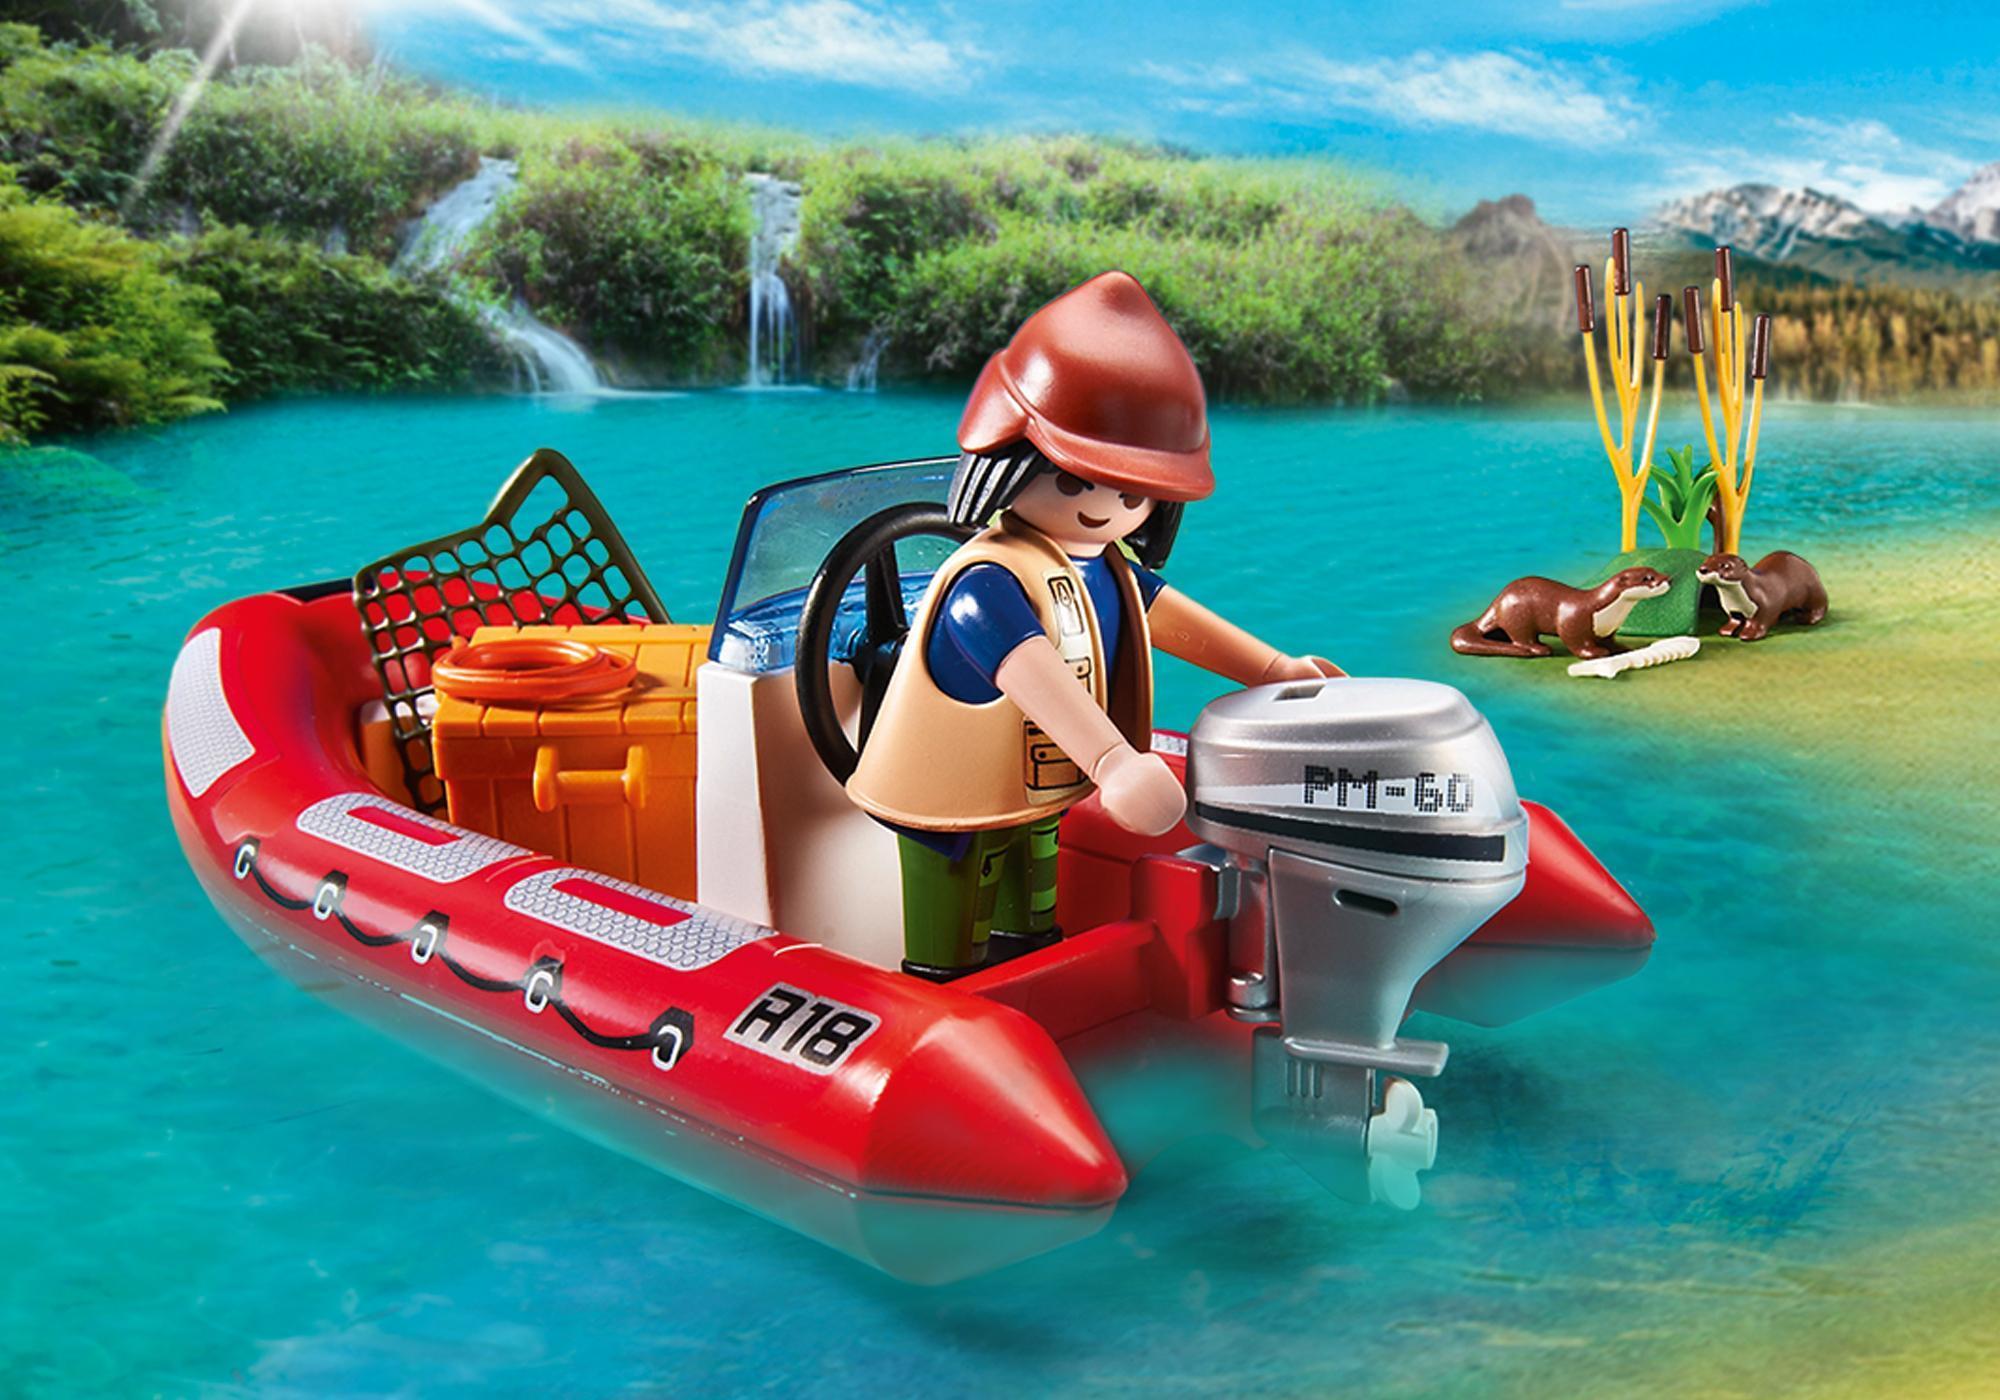 http://media.playmobil.com/i/playmobil/5559_product_extra2/Braconniers avec bateau